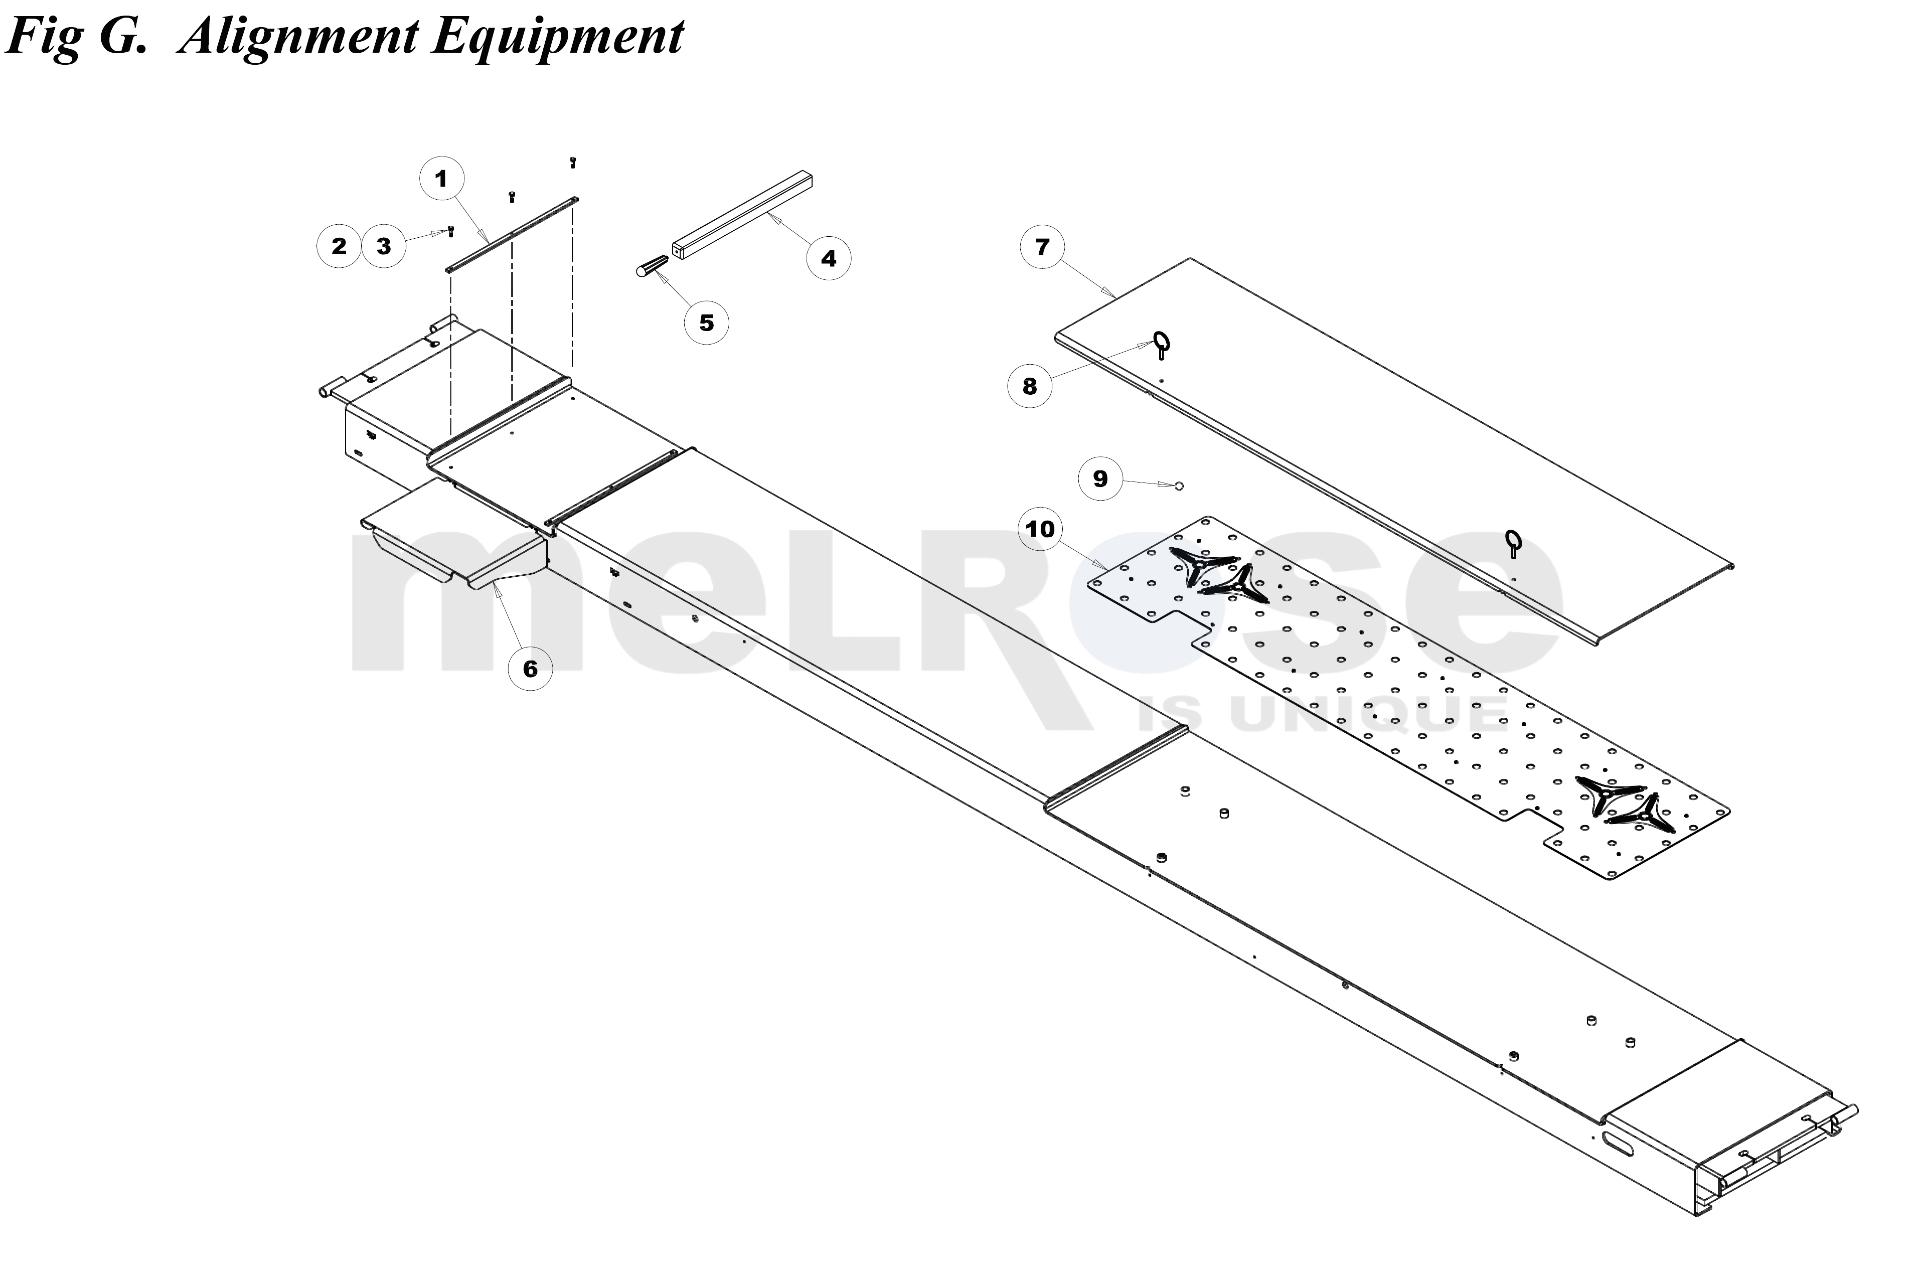 40000-closed-alignment-equipment-diagram-marked.jpg